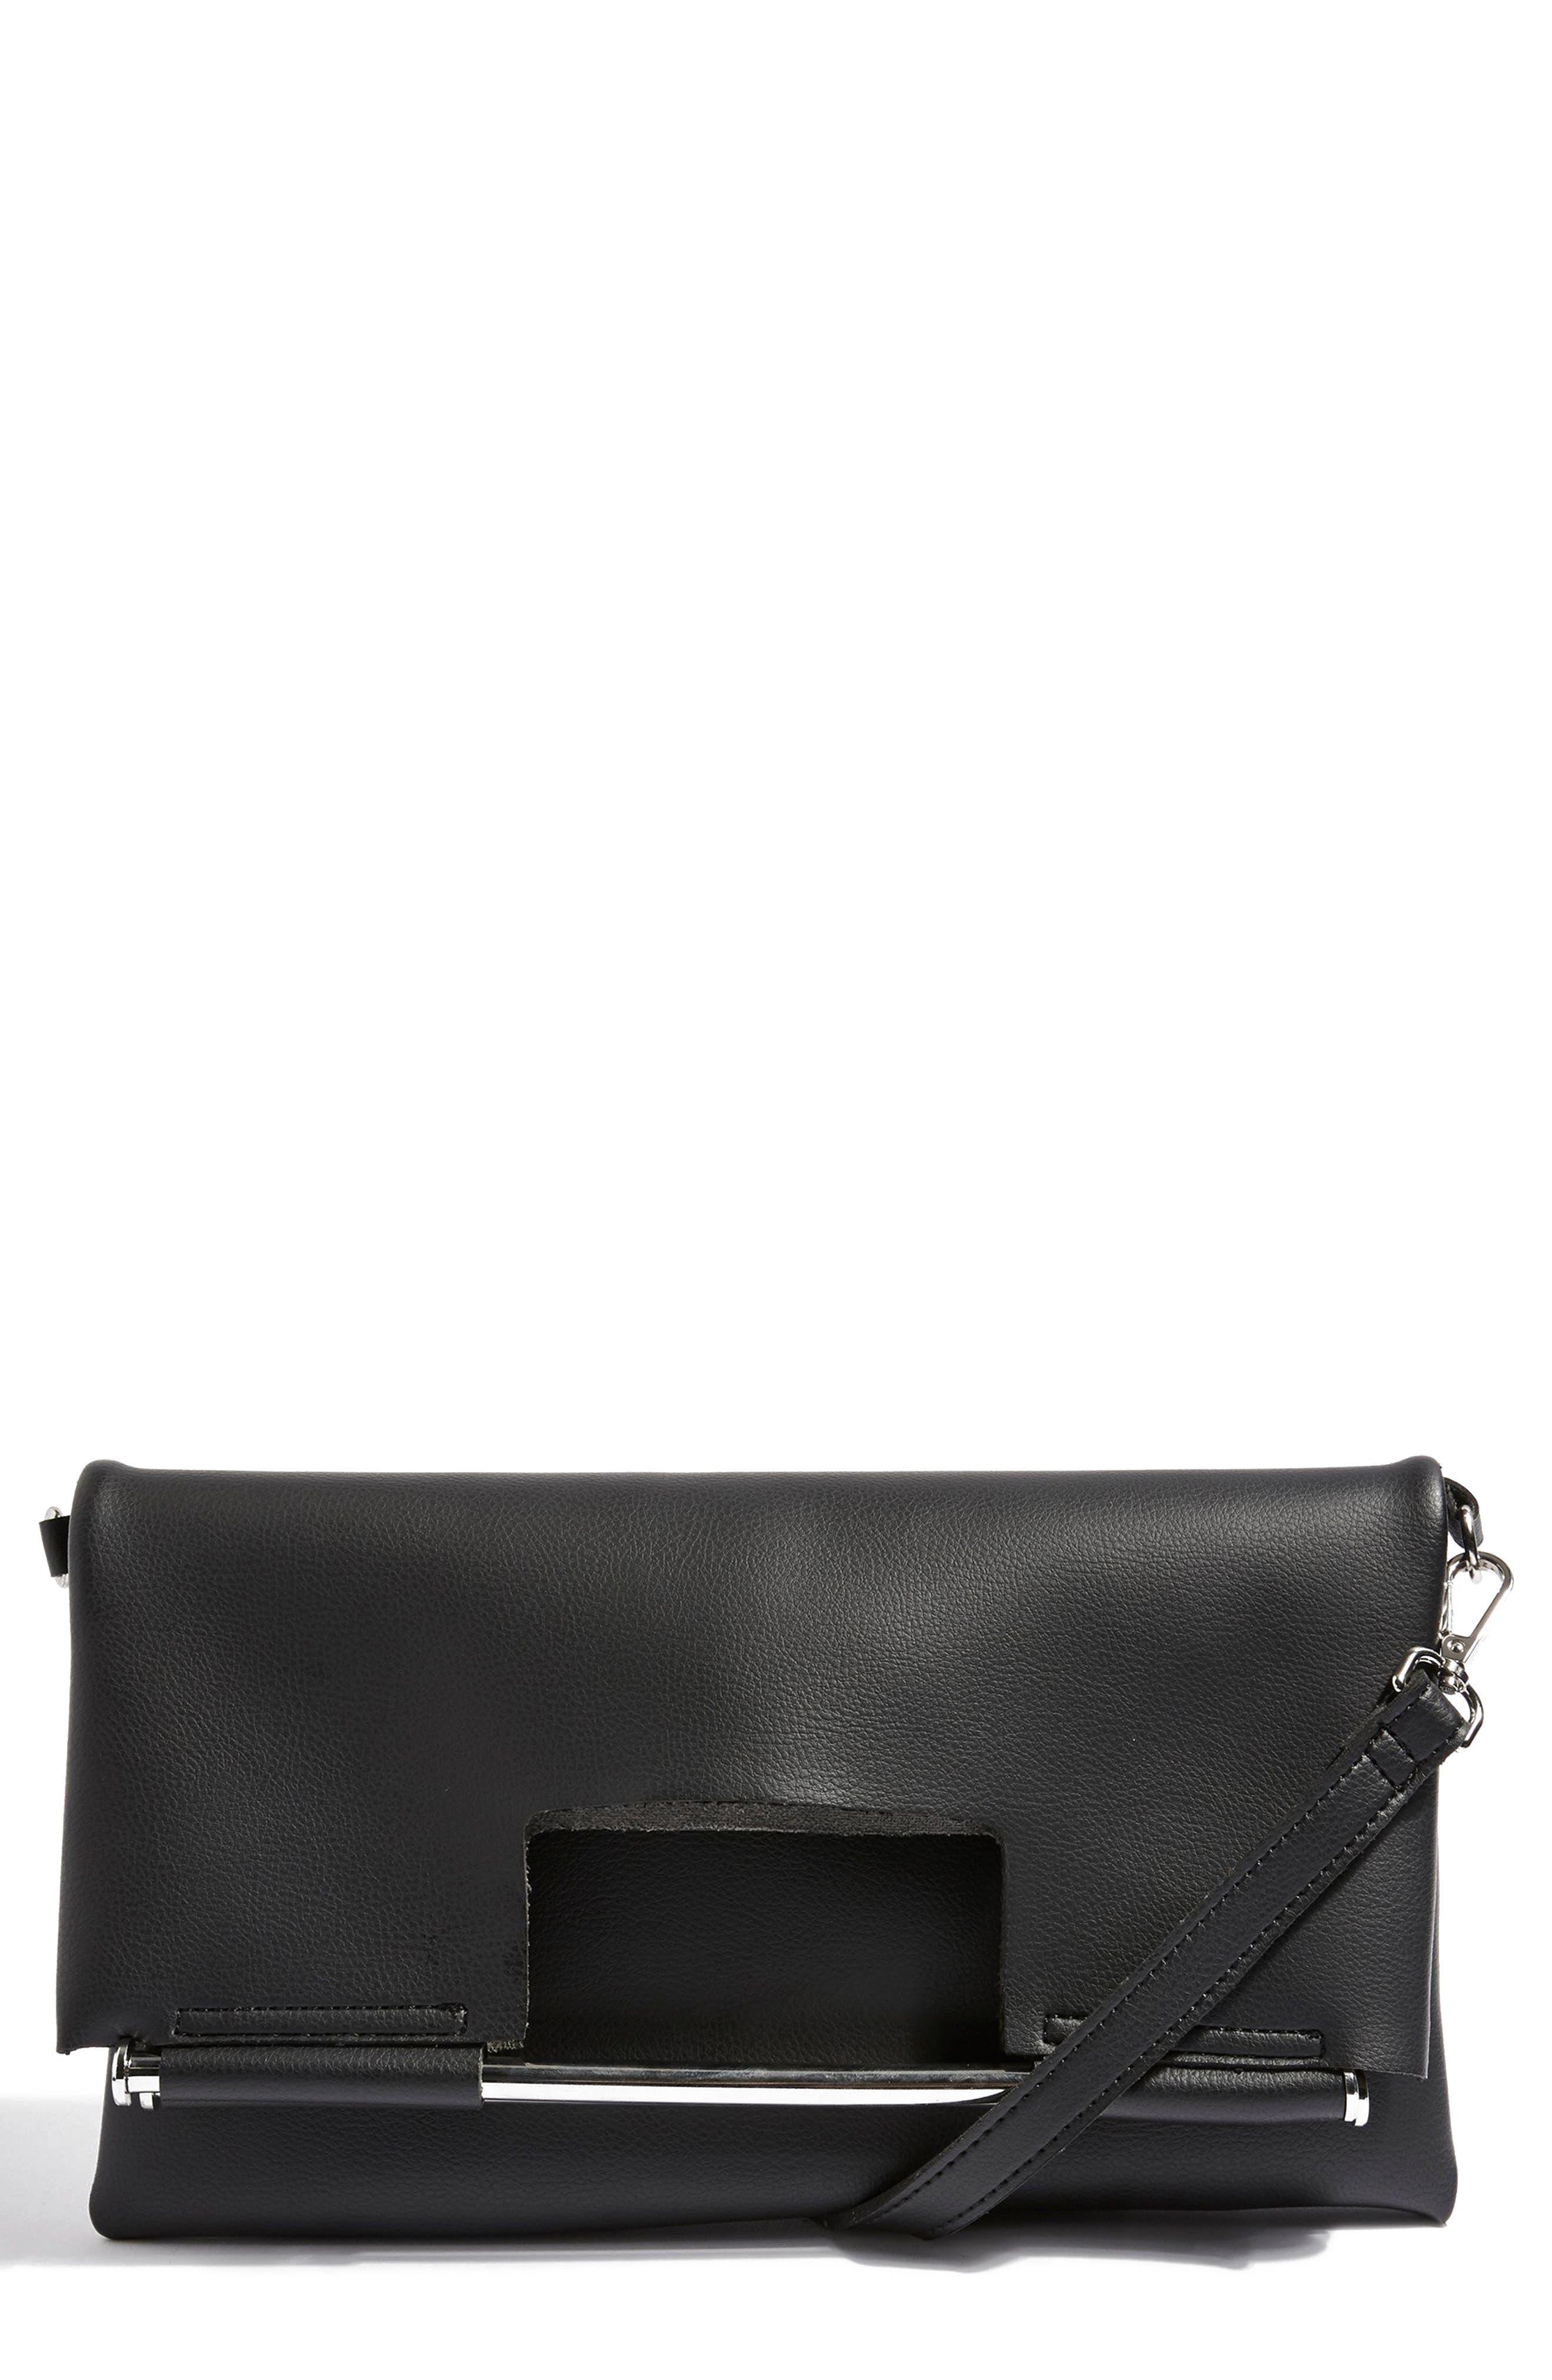 Topshop Lotus Metal Handle Clutch Bag